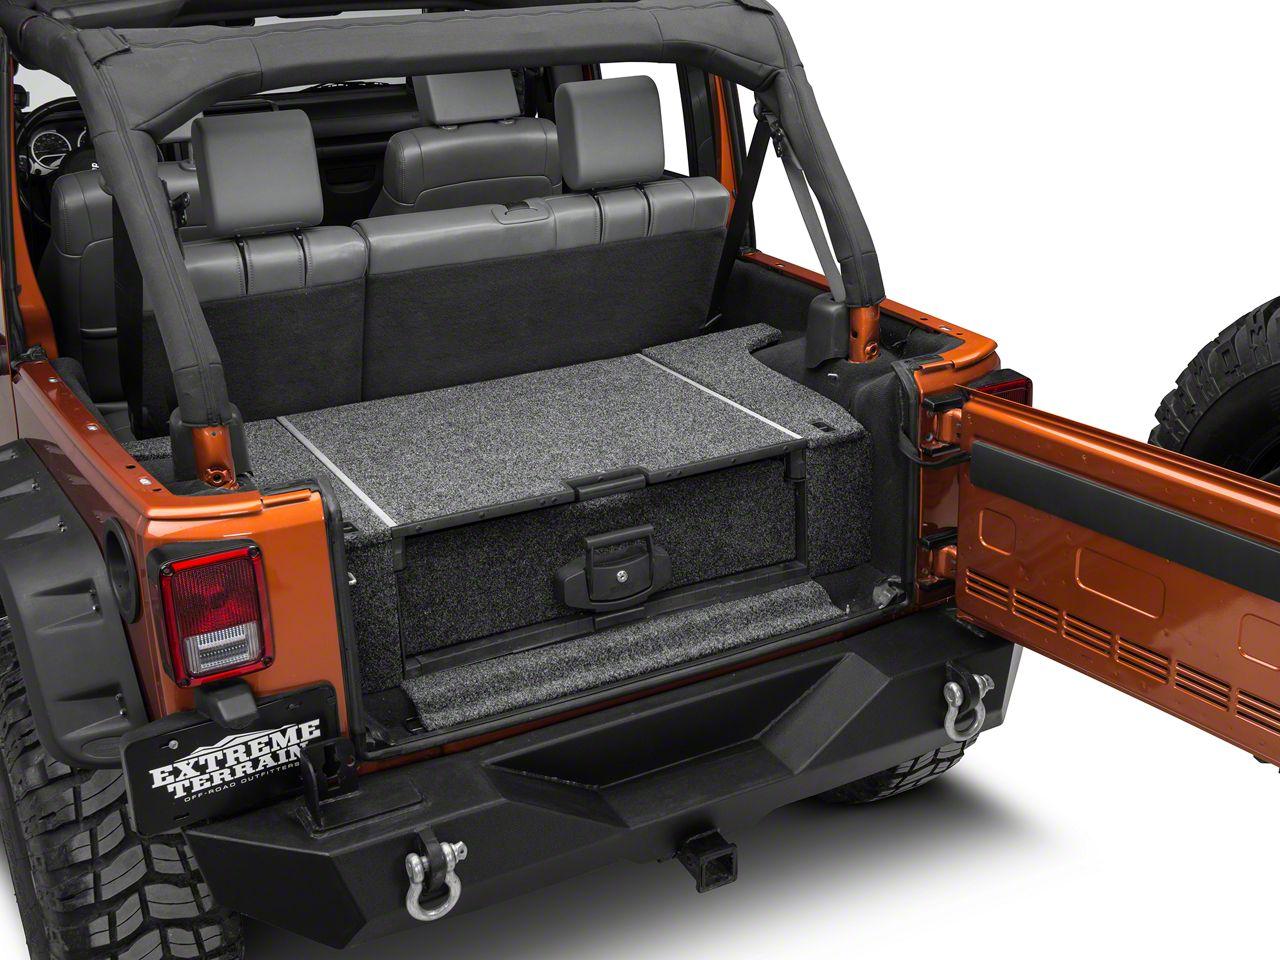 Metal Trunk Organizer Right Side Rear Cargo Rack Shelf Cargo Storage Box for 2007-2018 Jeep Wrangler JK /& Unlimited 4-Door